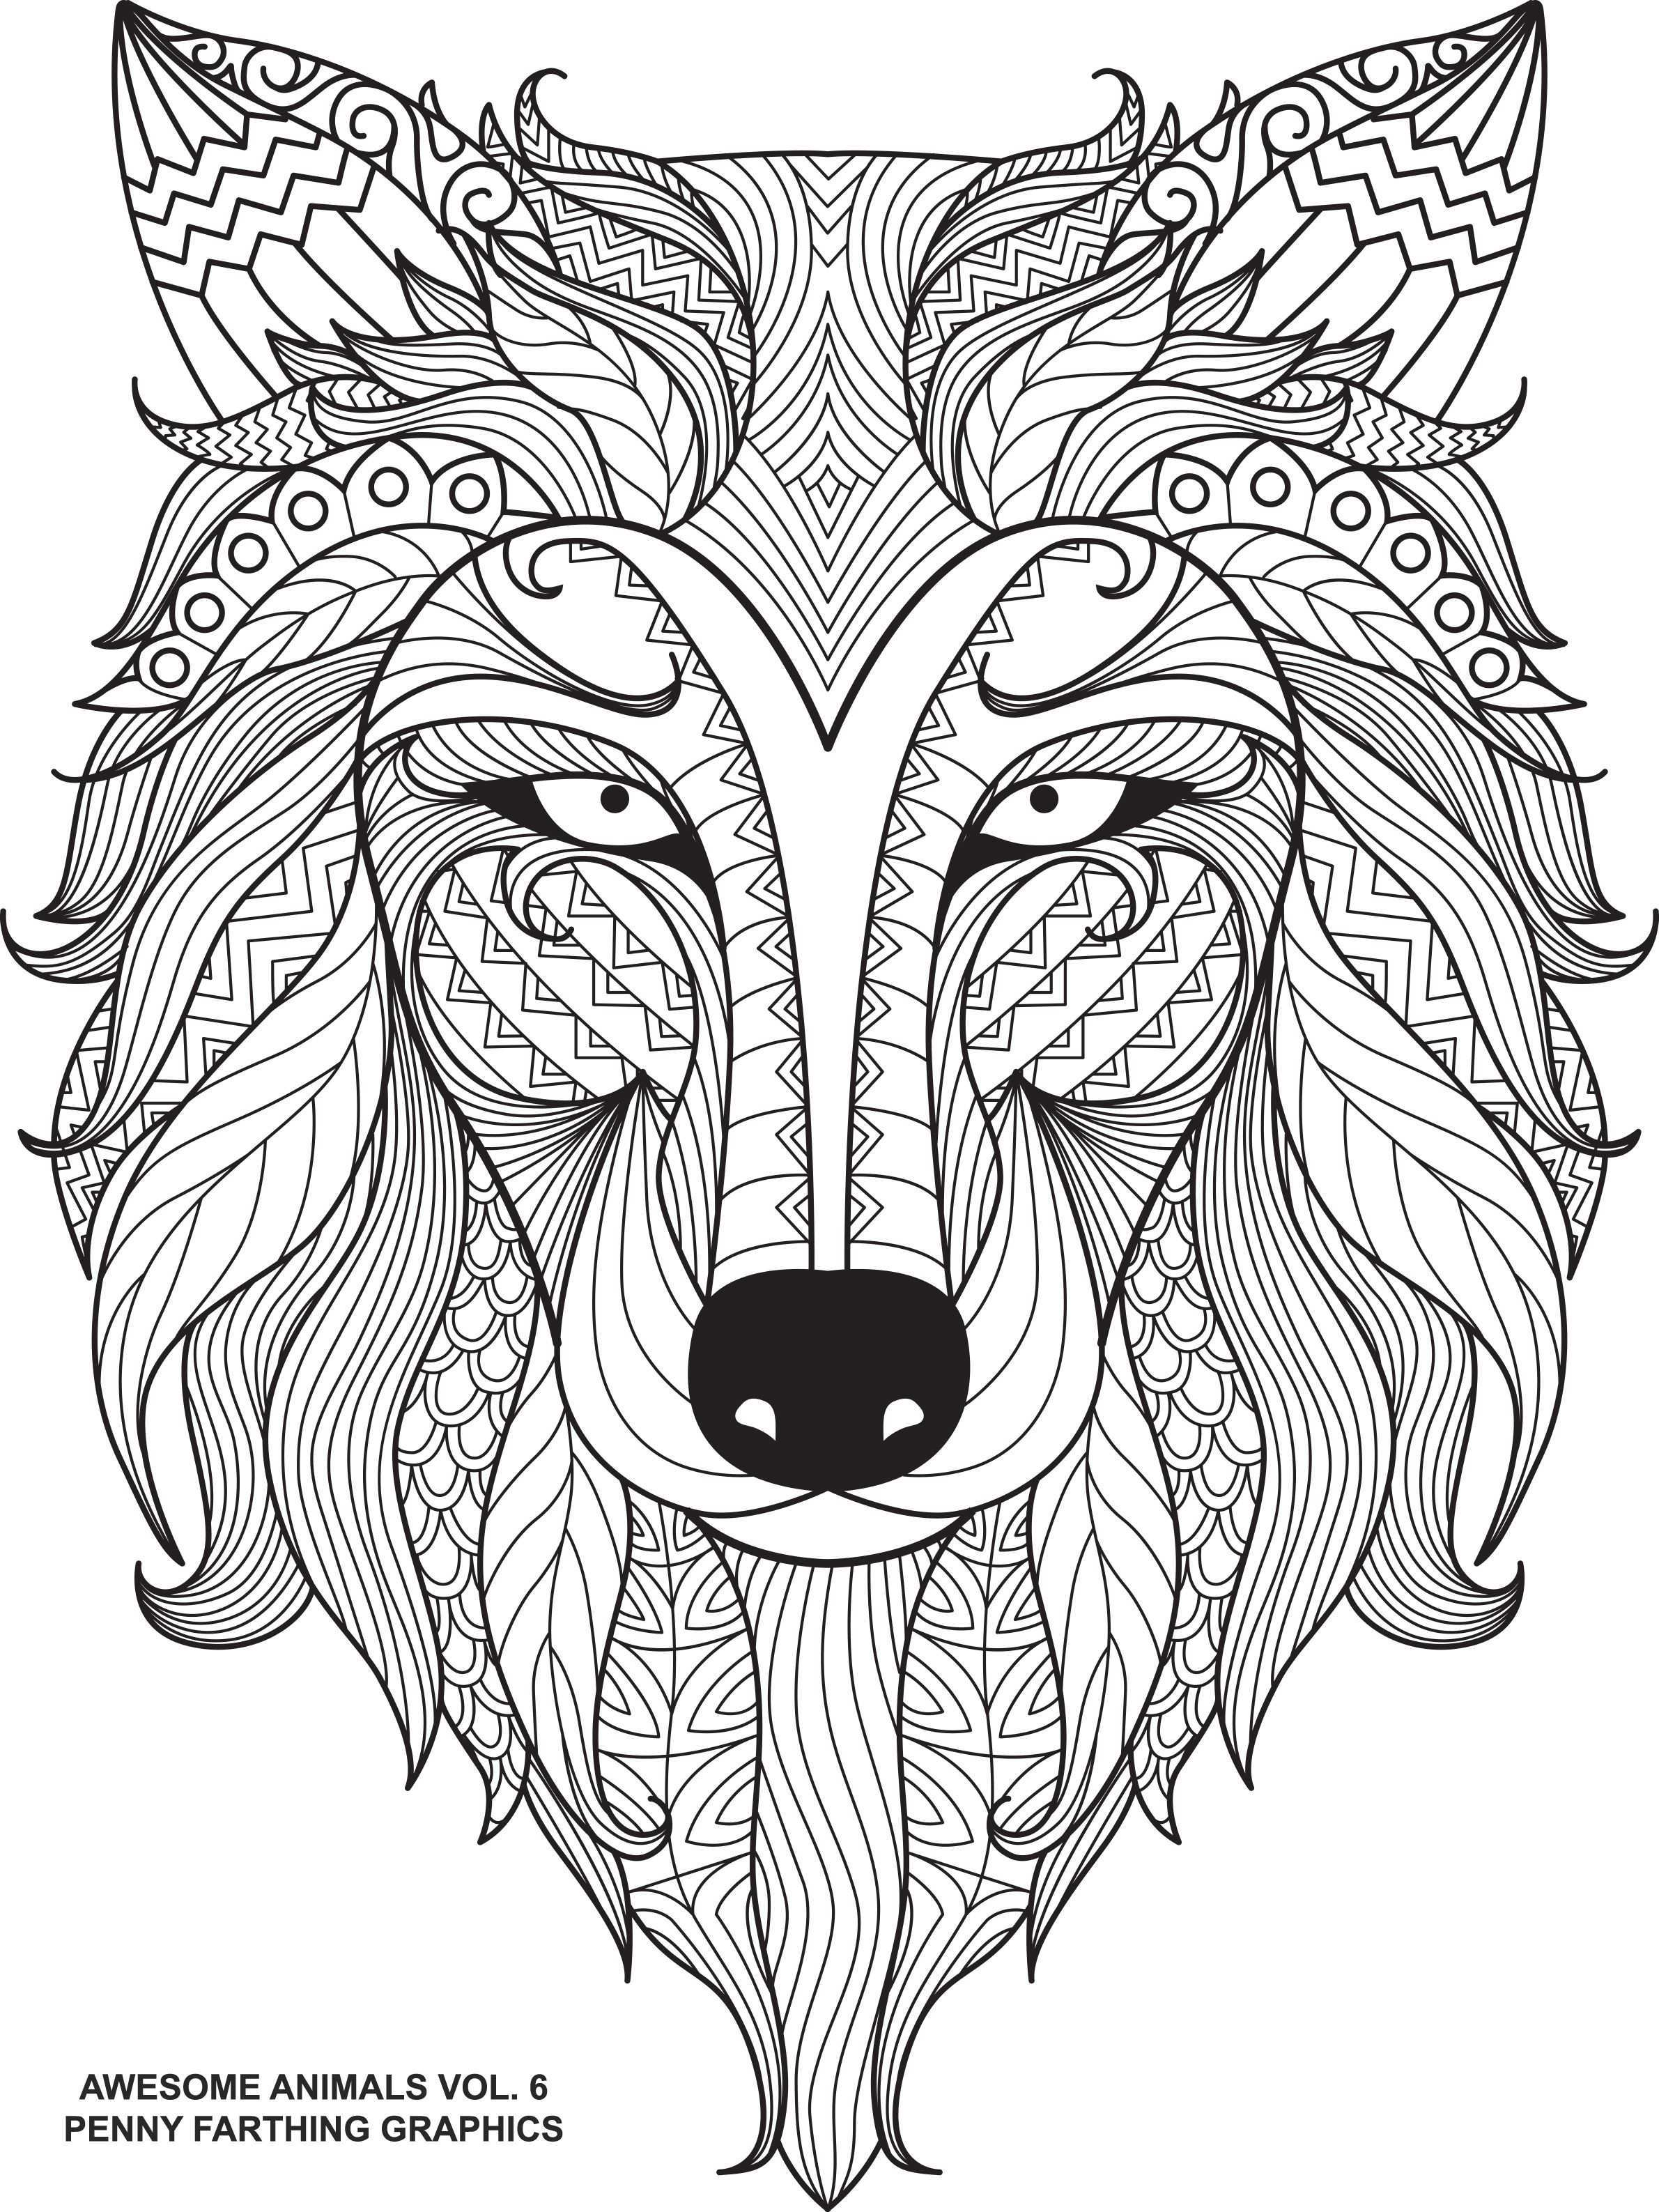 Wolf From Awesome Animals Volume 6 Mandala Kleurplaten Kleurplaten Kleurboek